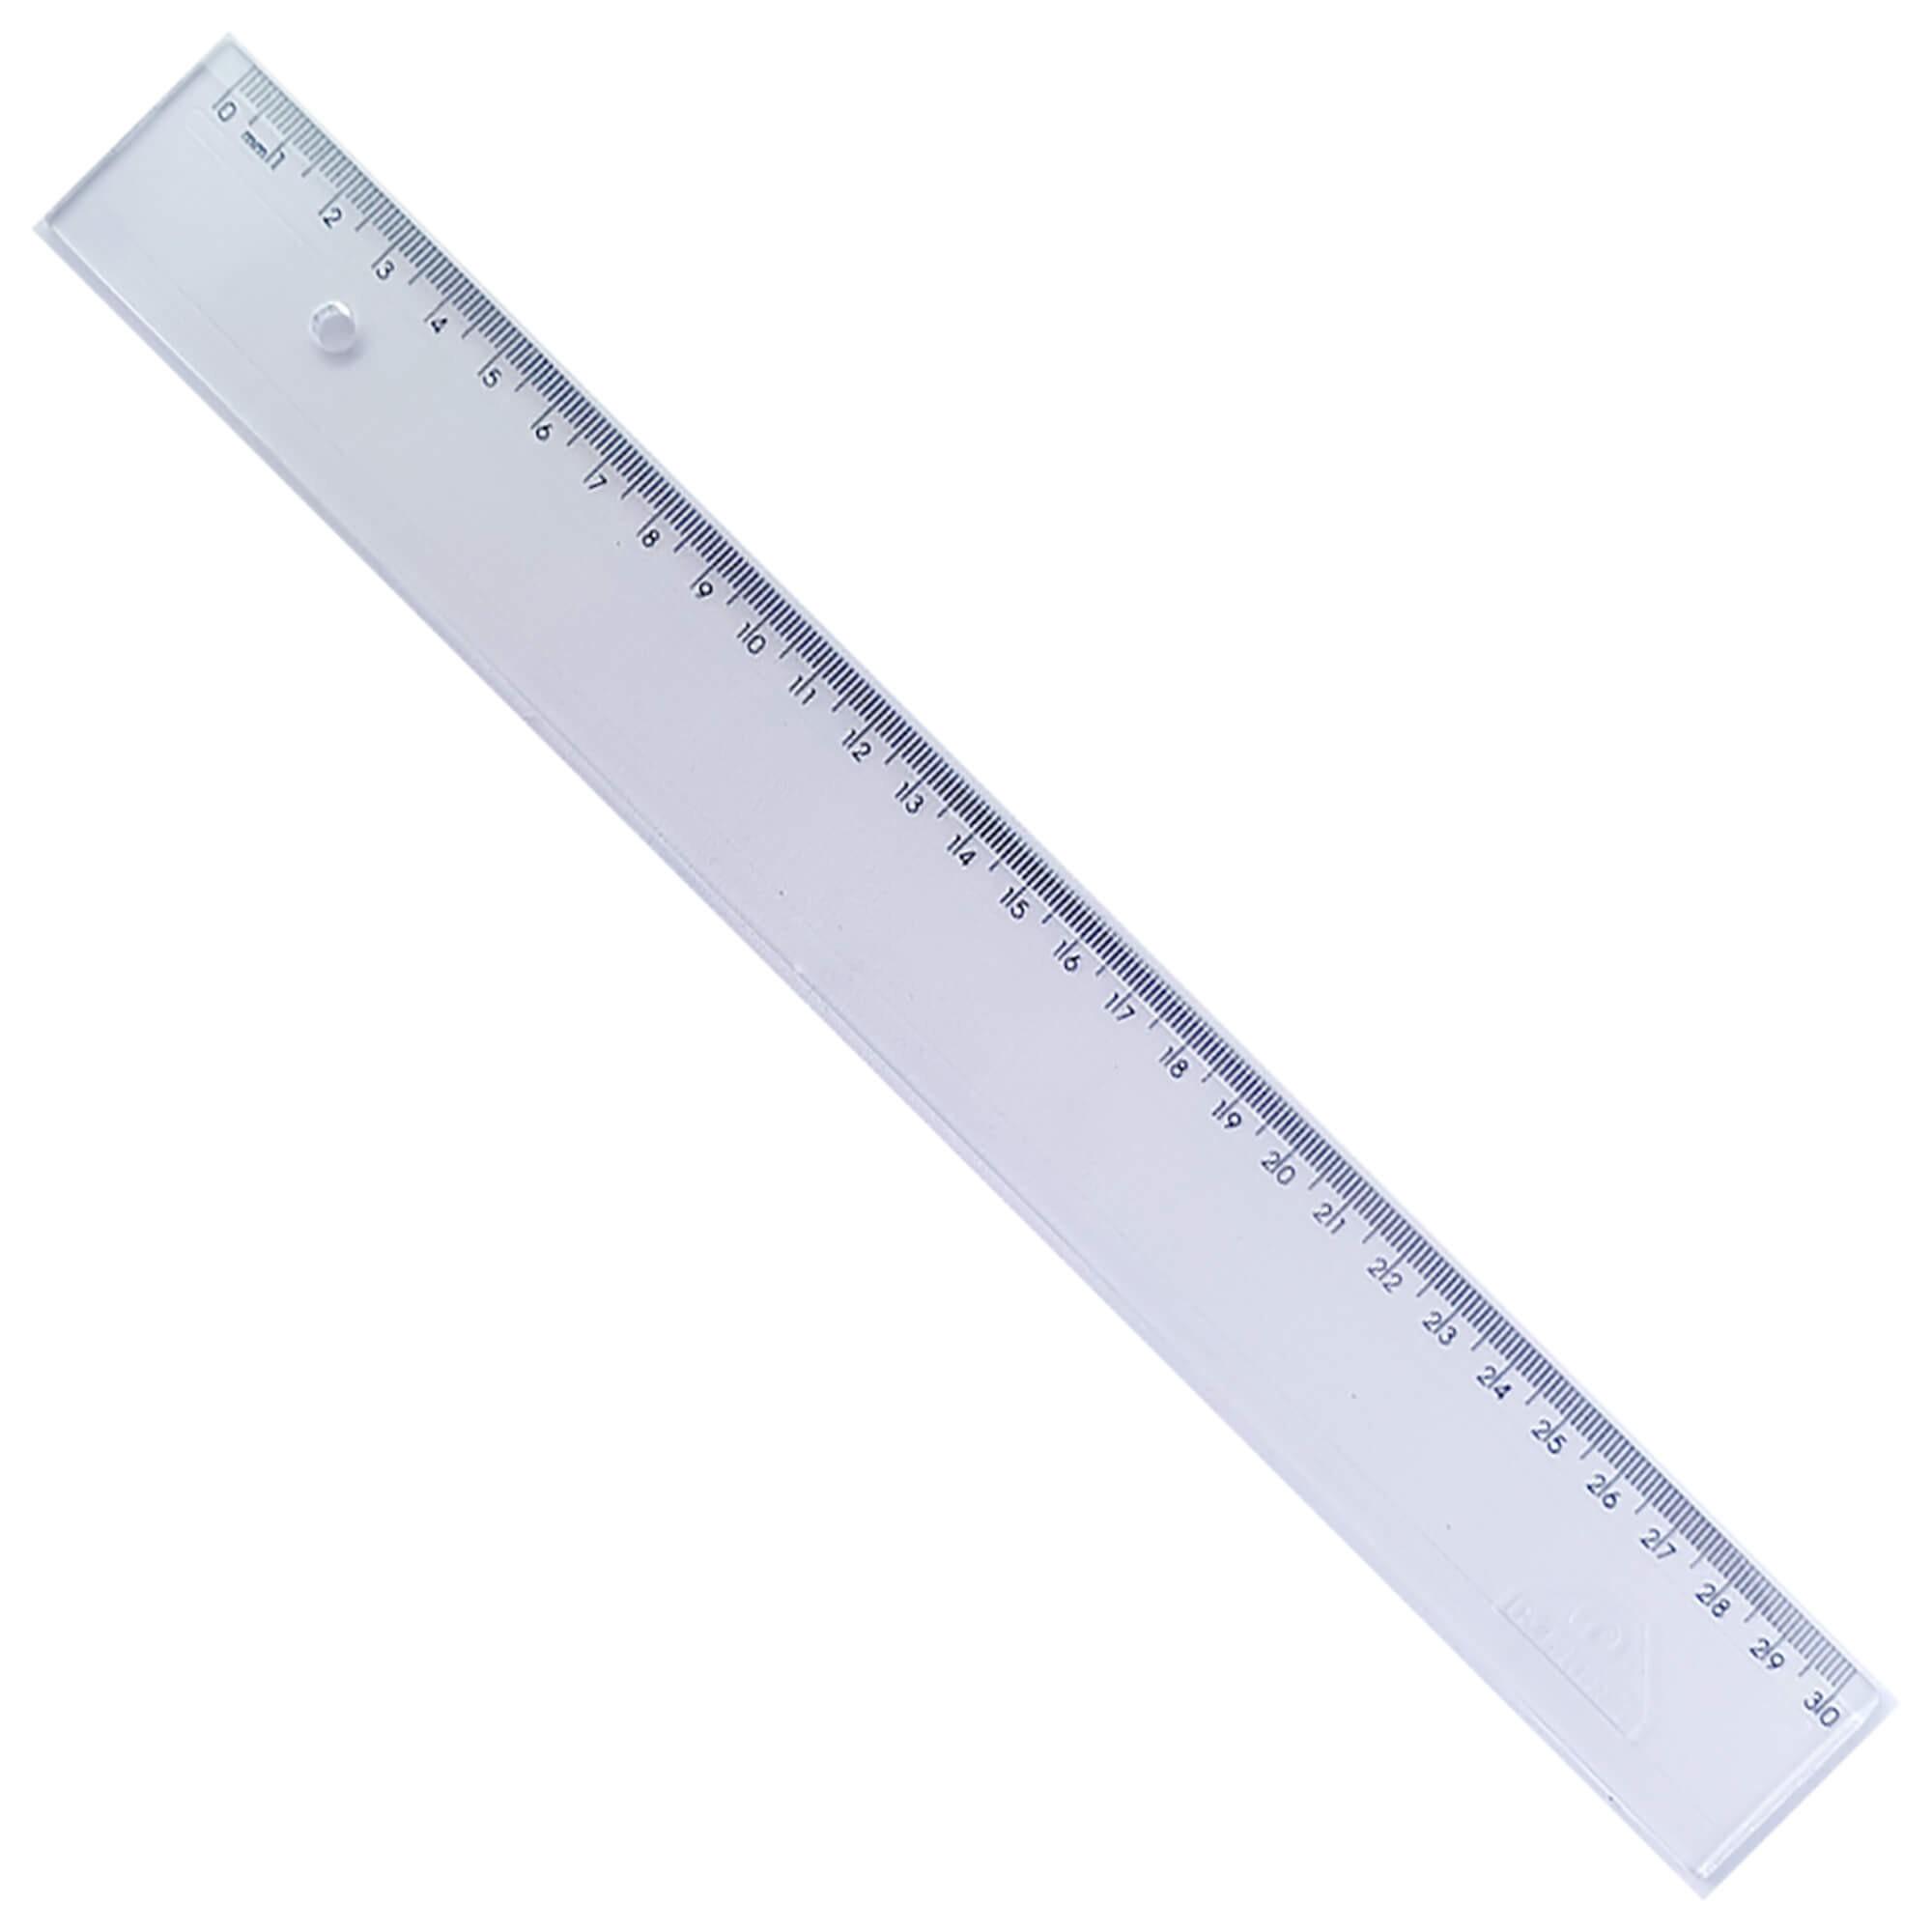 Regua em Poliestireno 30 cm Cristal 981.0  1 UN - Acrimet